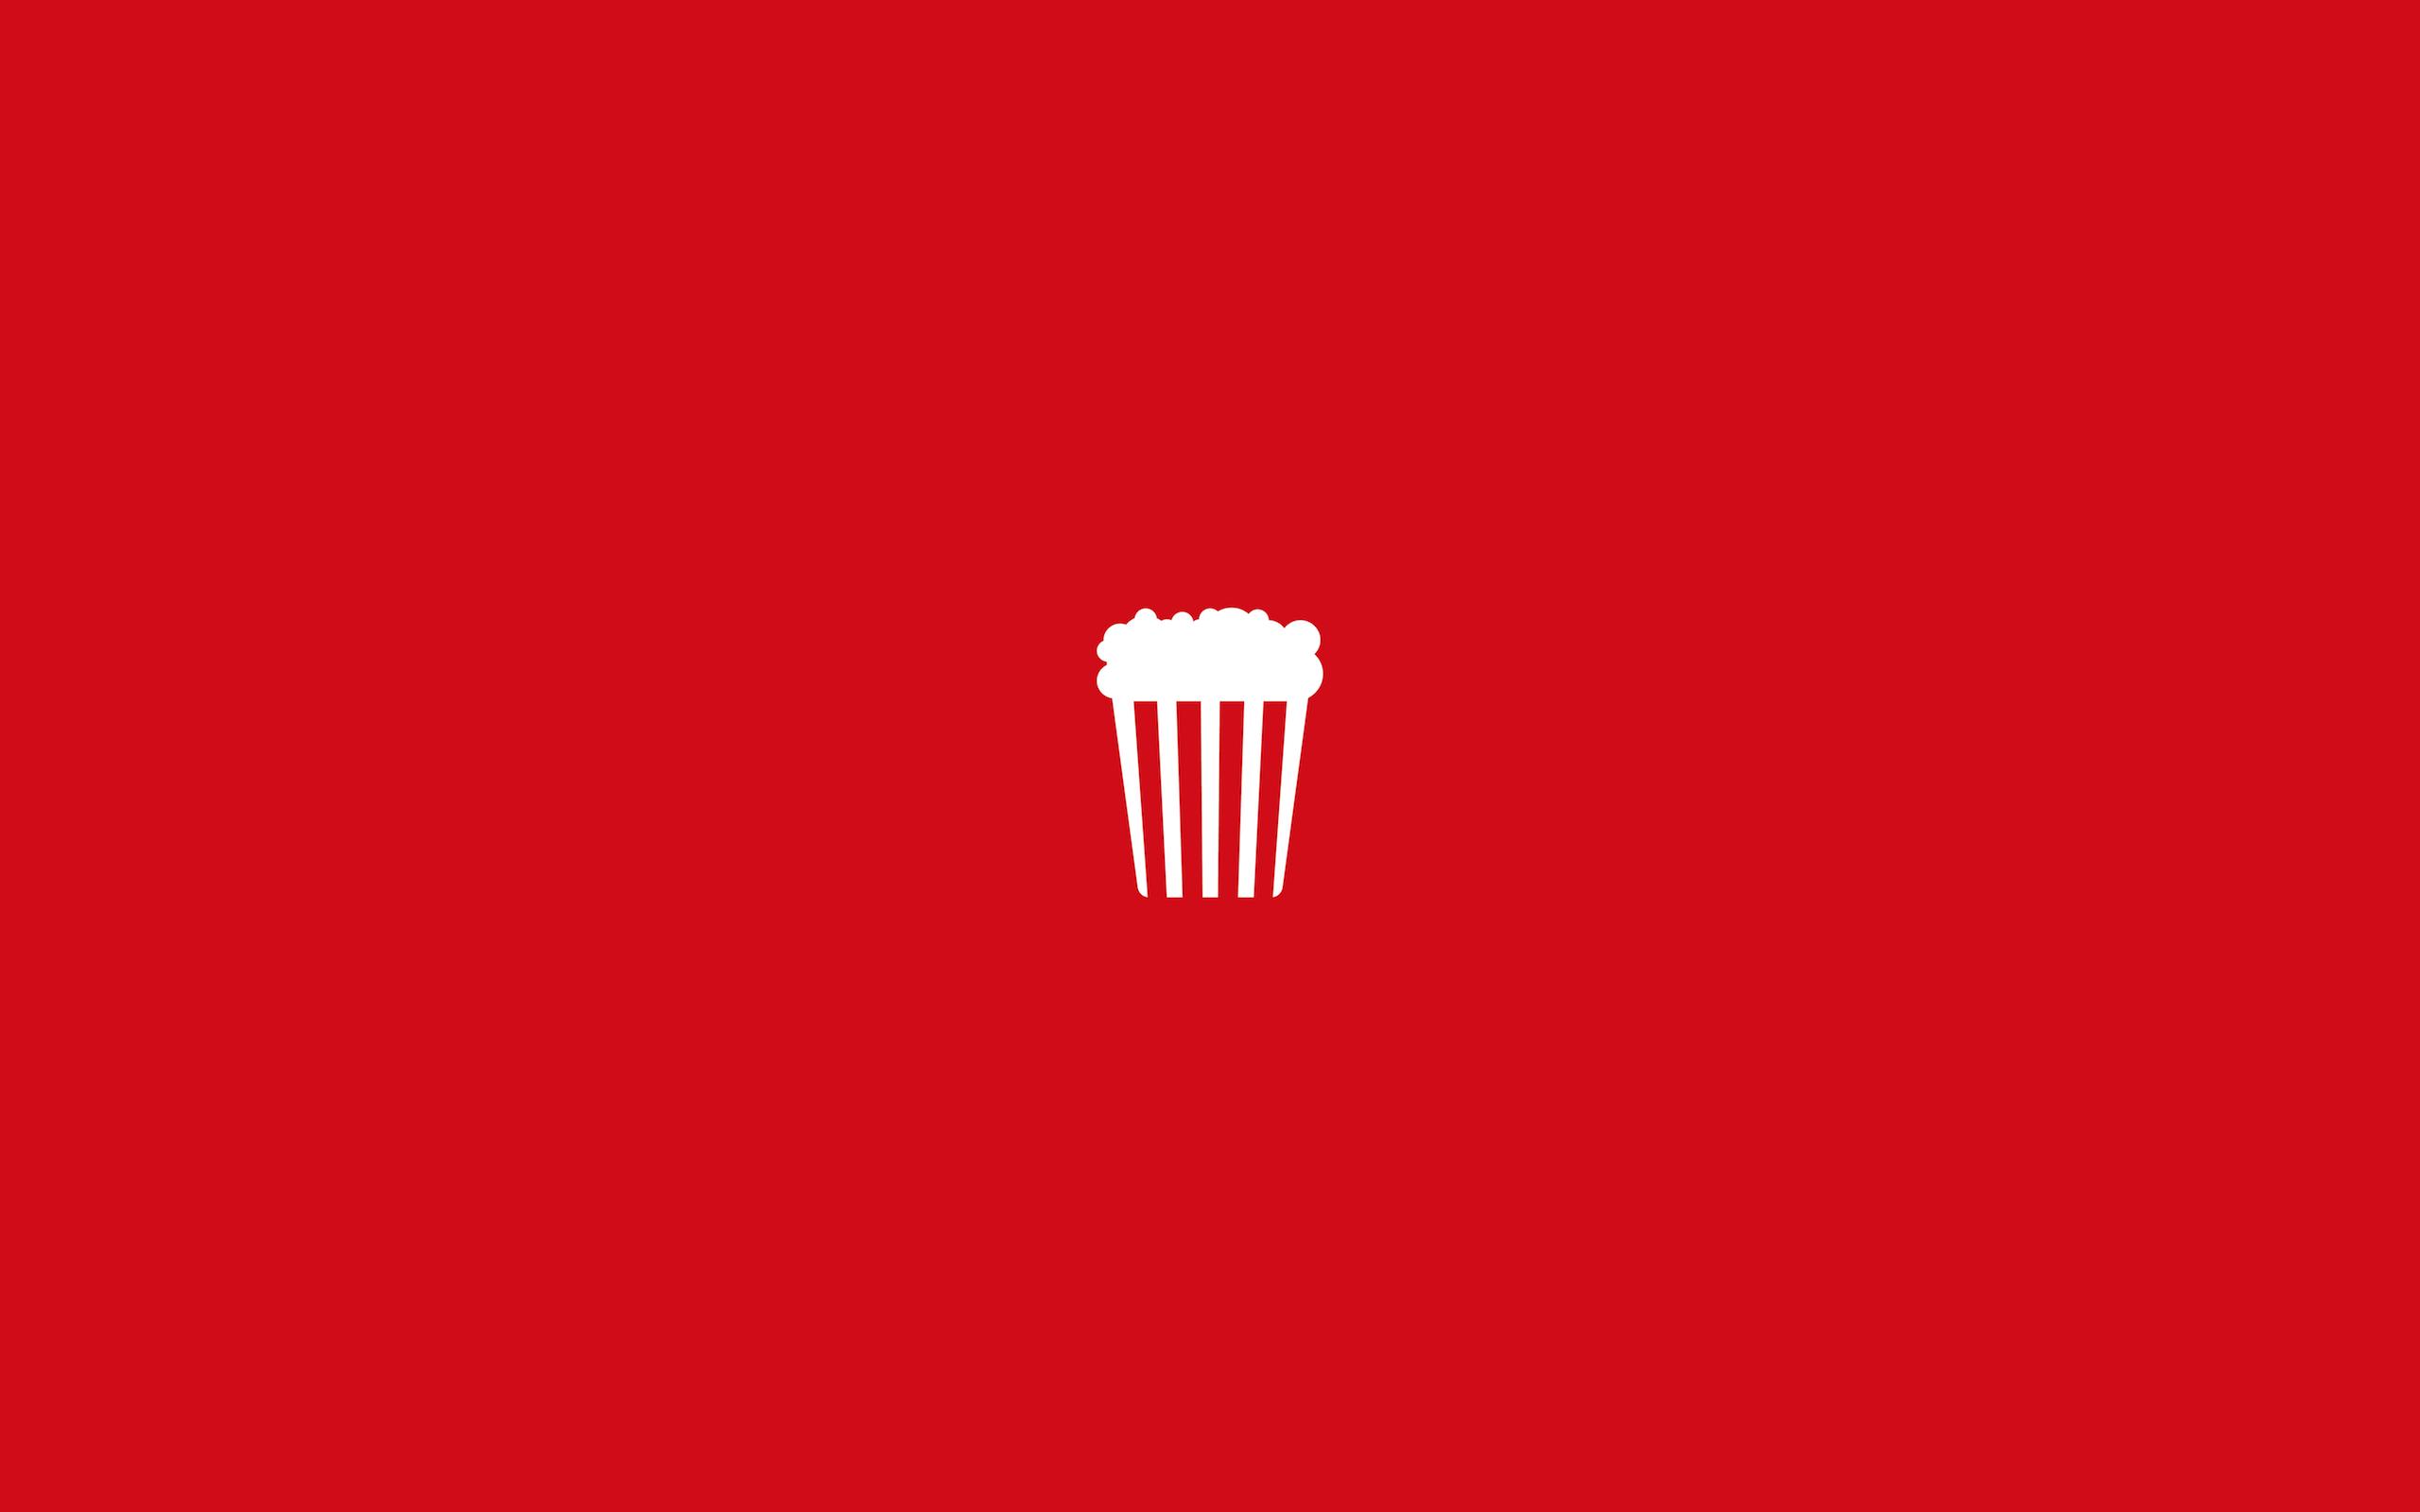 Wallpaper Popcorn Minimalism Red Background 2560x1600